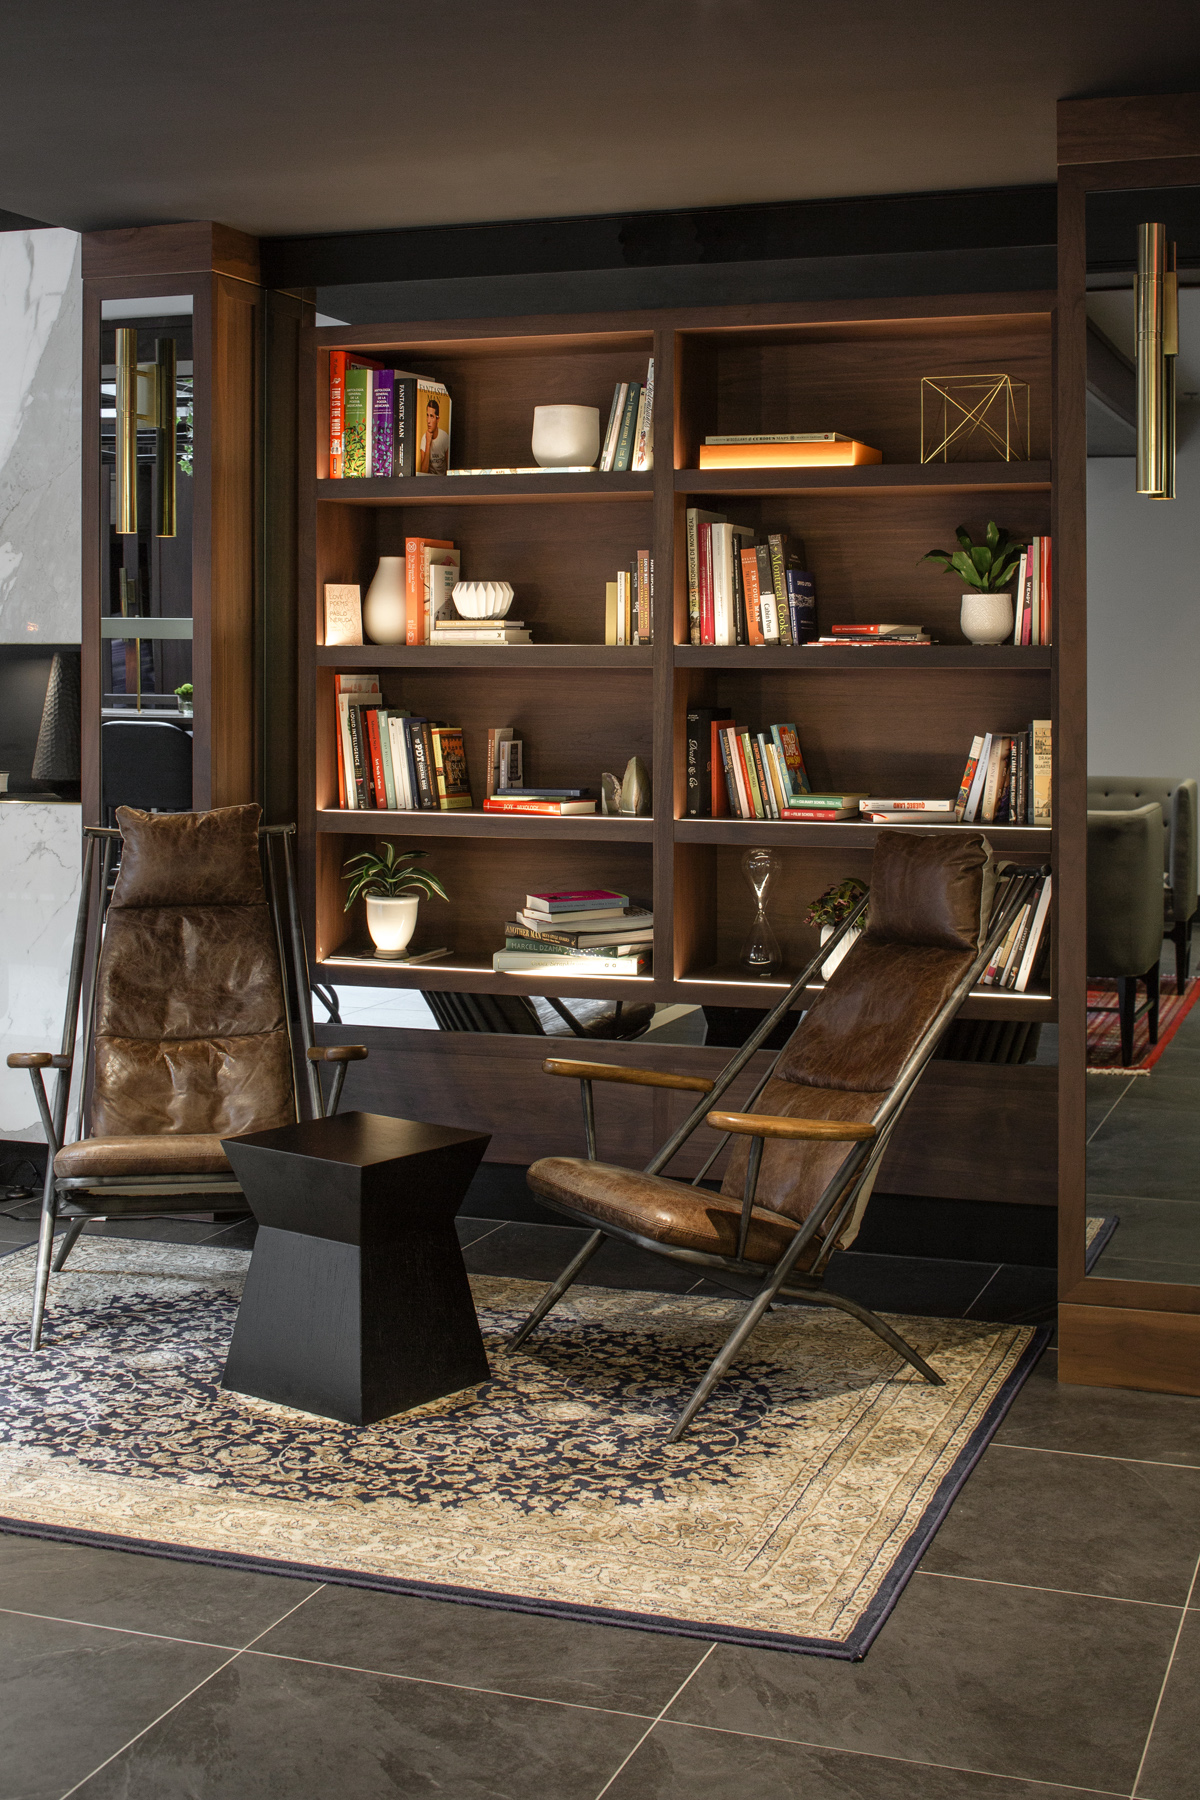 Lobby - Livingroom